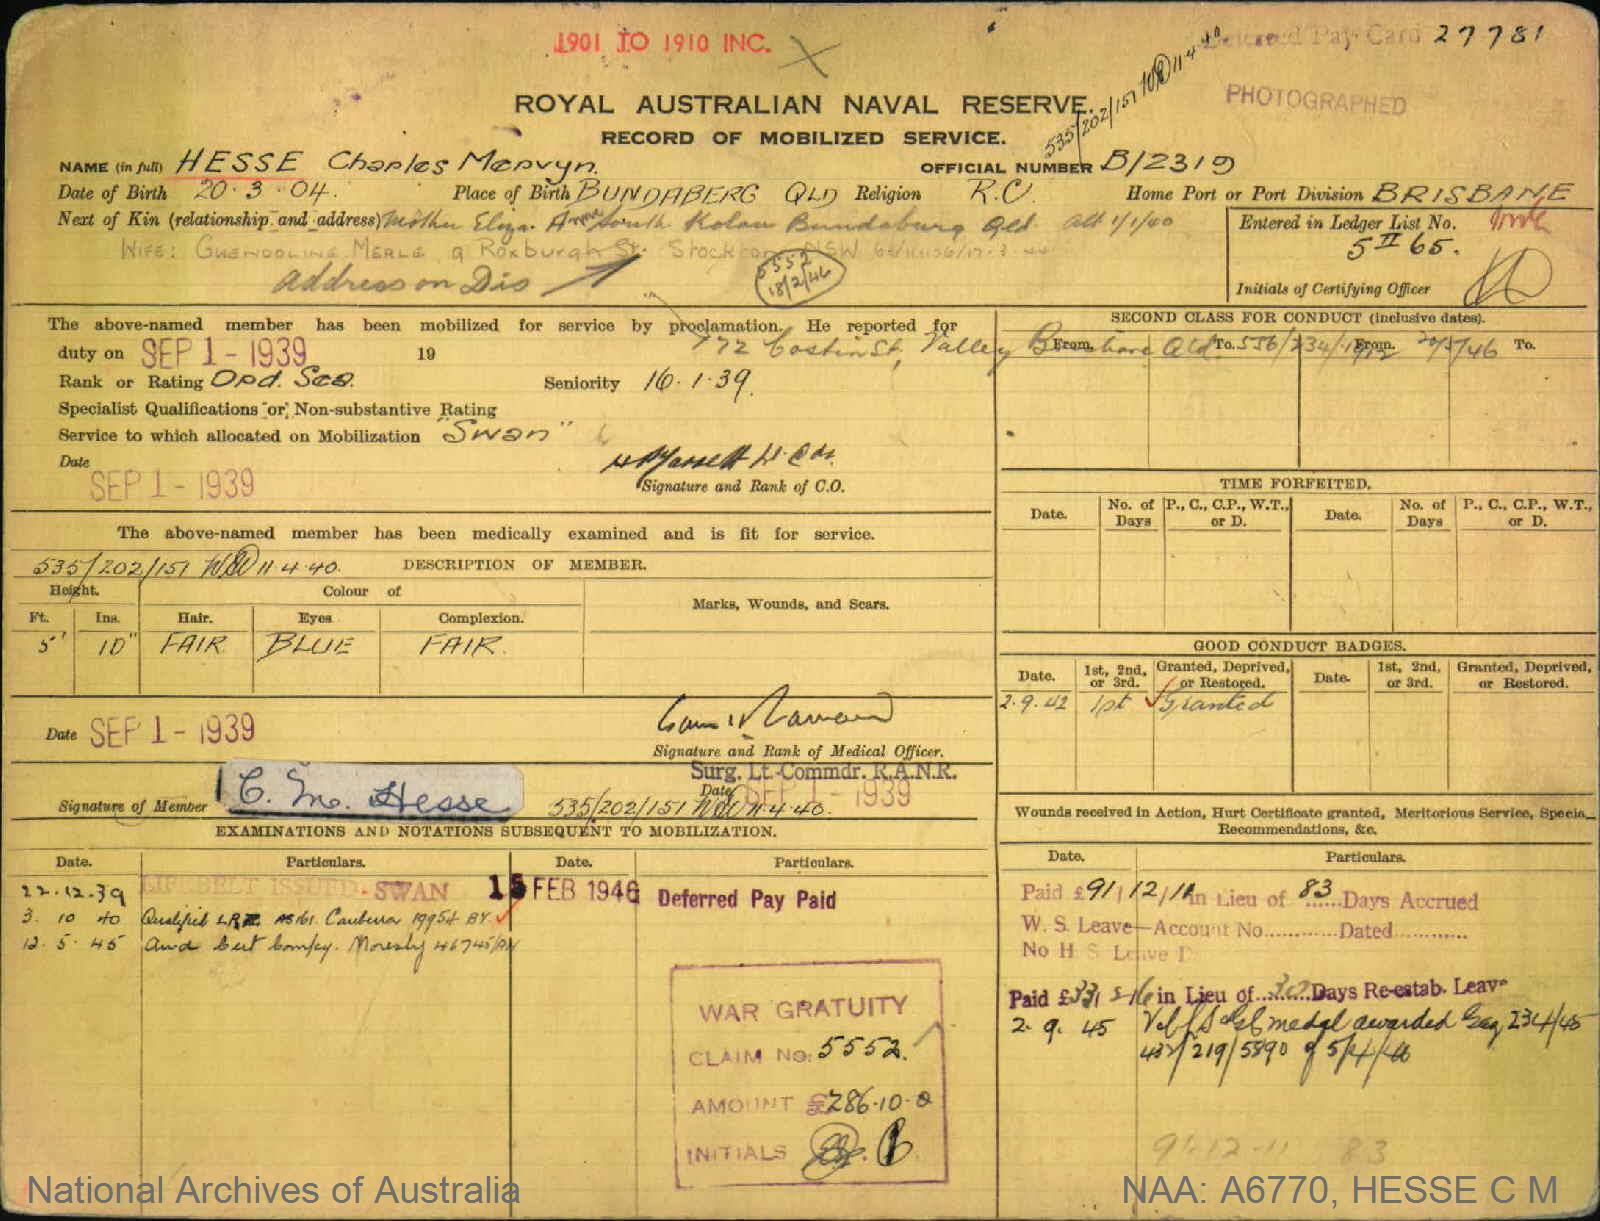 HESSE CHARLES MERVYN : Service Number - B/2319 : Date of birth - 20 Mar 1904 : Place of birth - BUNDABERG QLD : Place of enlistment - BRISBANE : Next of Kin - GWENDOLINE